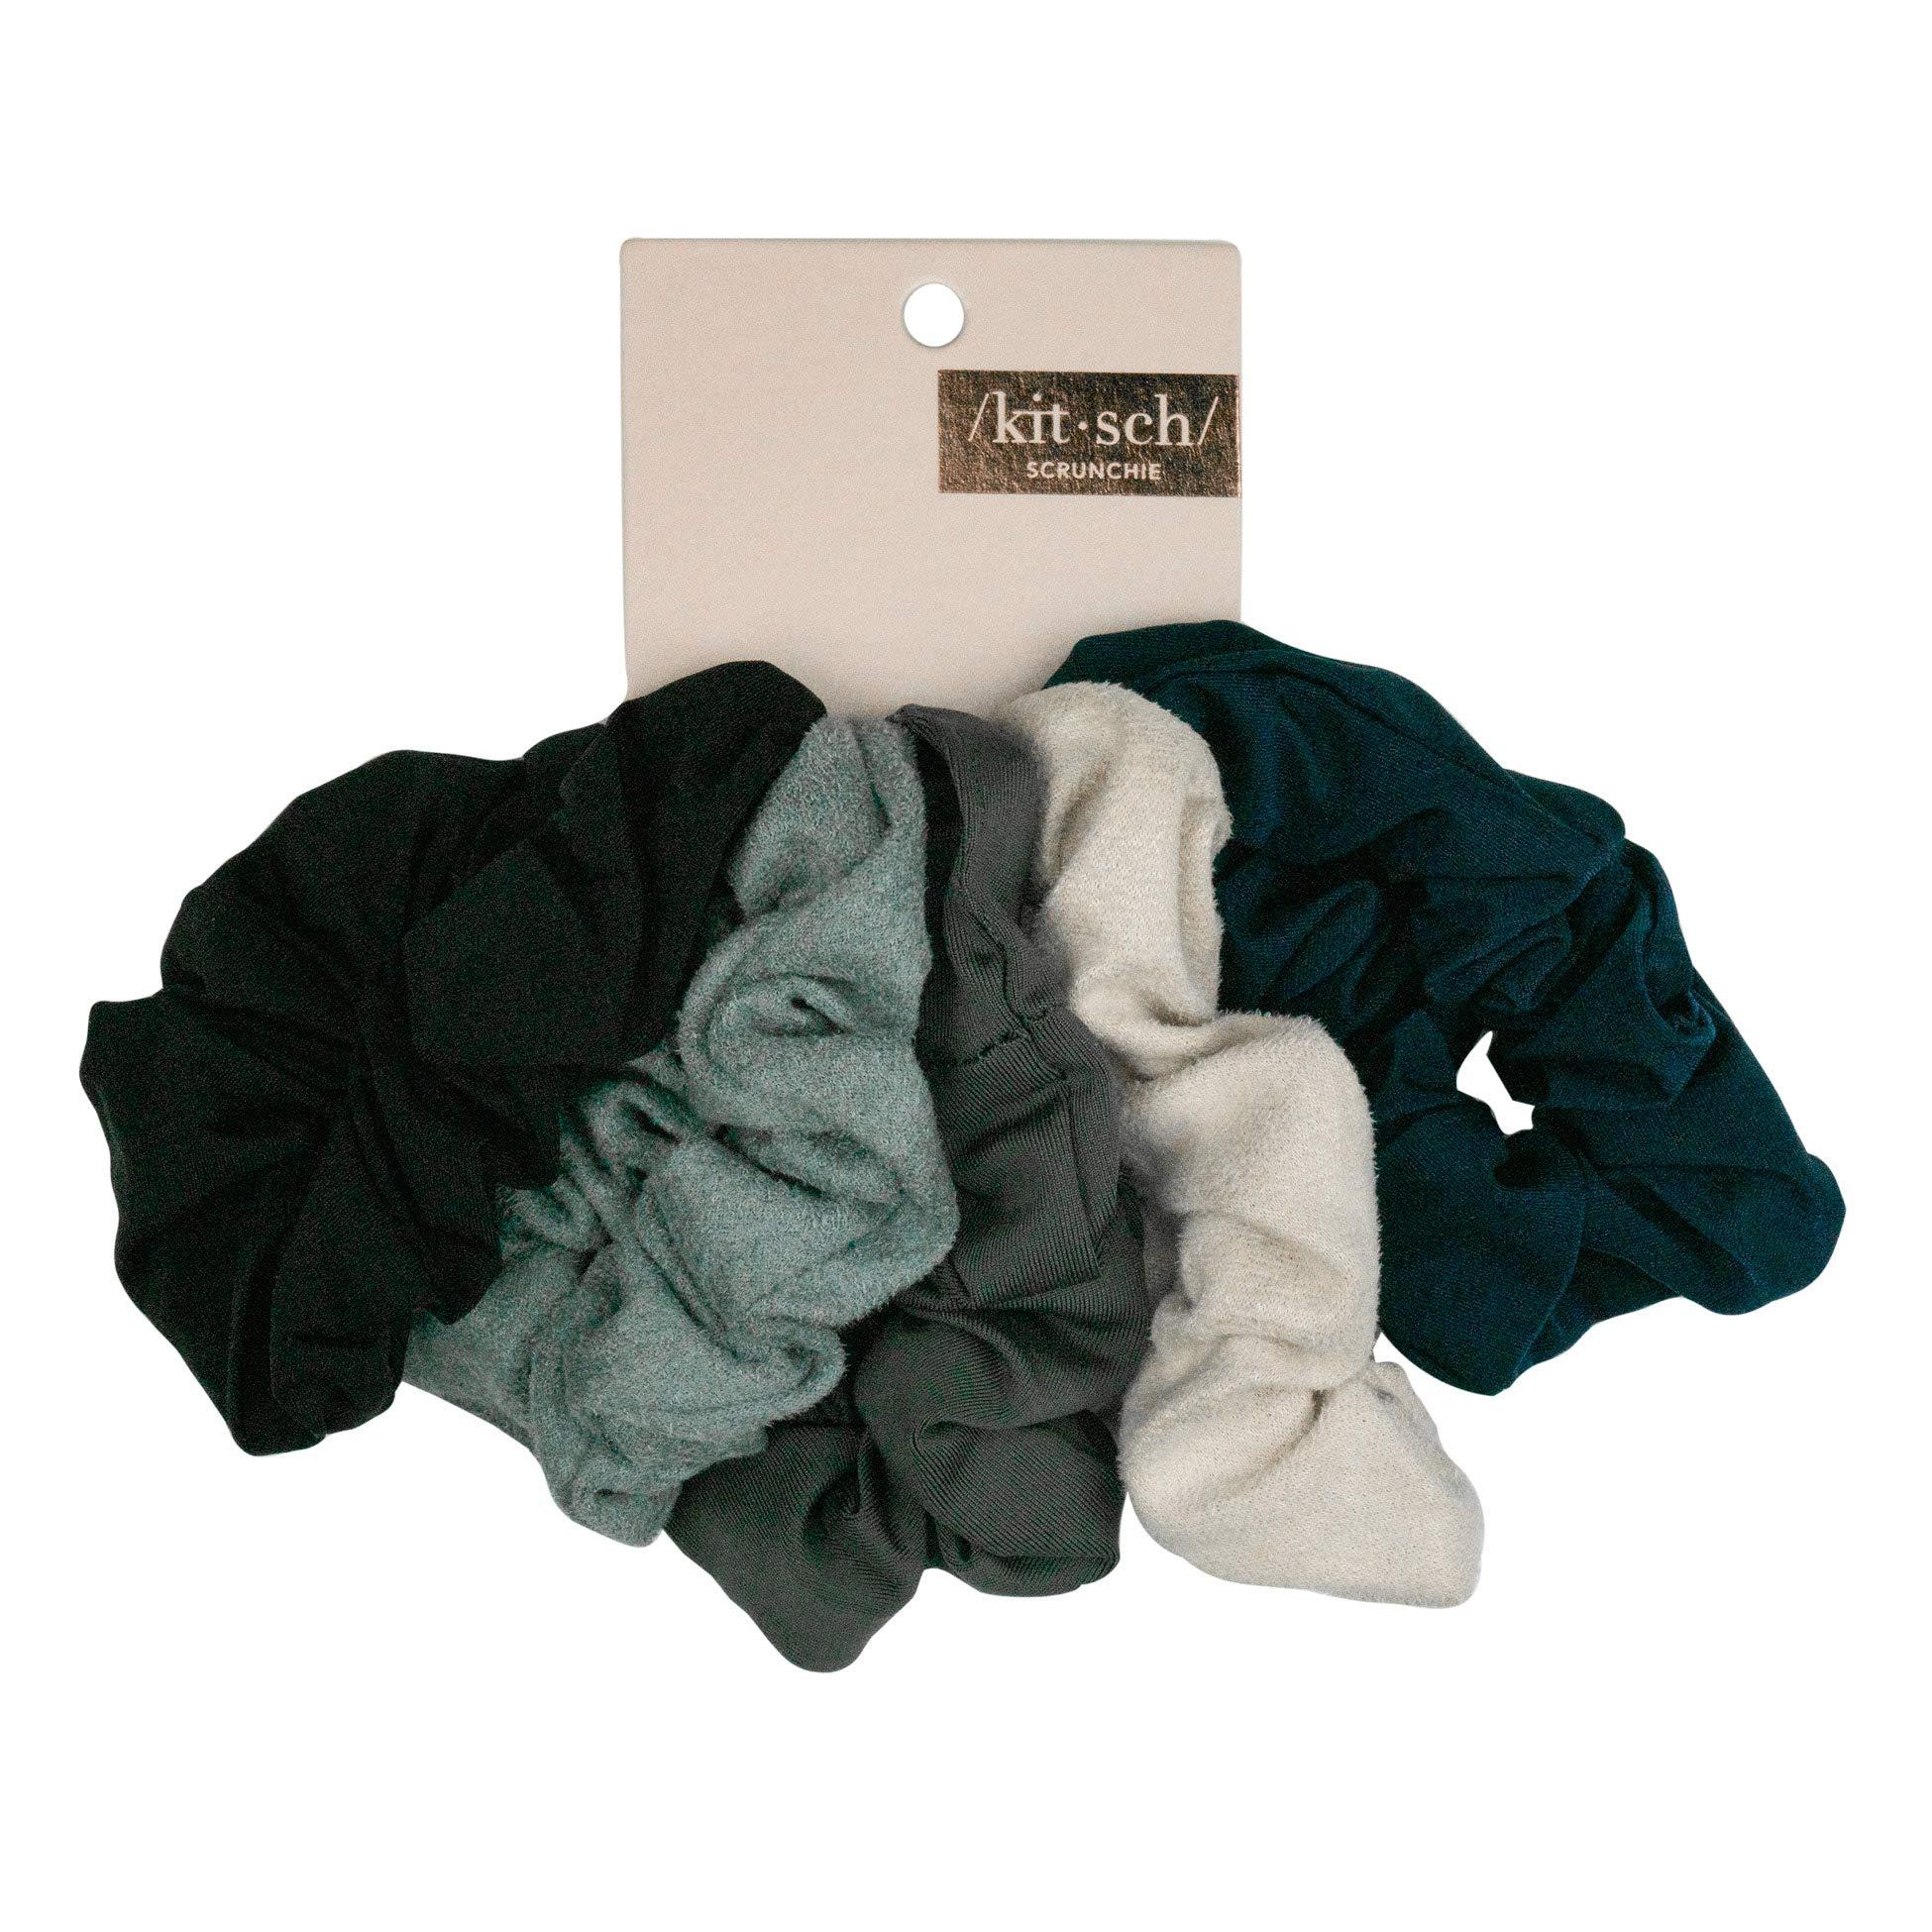 Kitsch Matte Scrunchies for Hair, Hair Scrunchies for Women, Scrunchy Hair Bands, 5 Pack (Black/Gray)